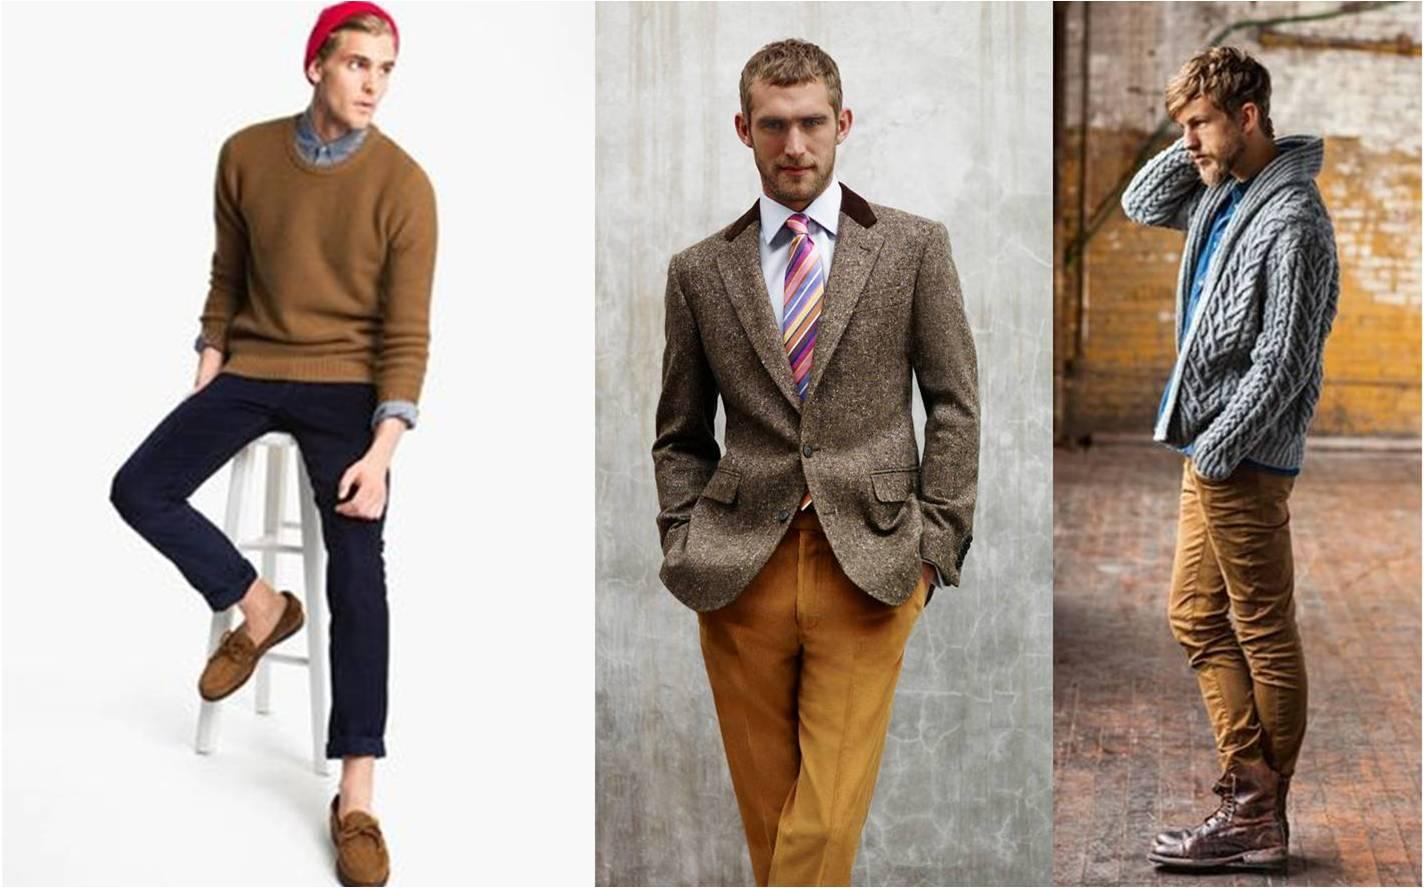 Corduroy outfit streetwear